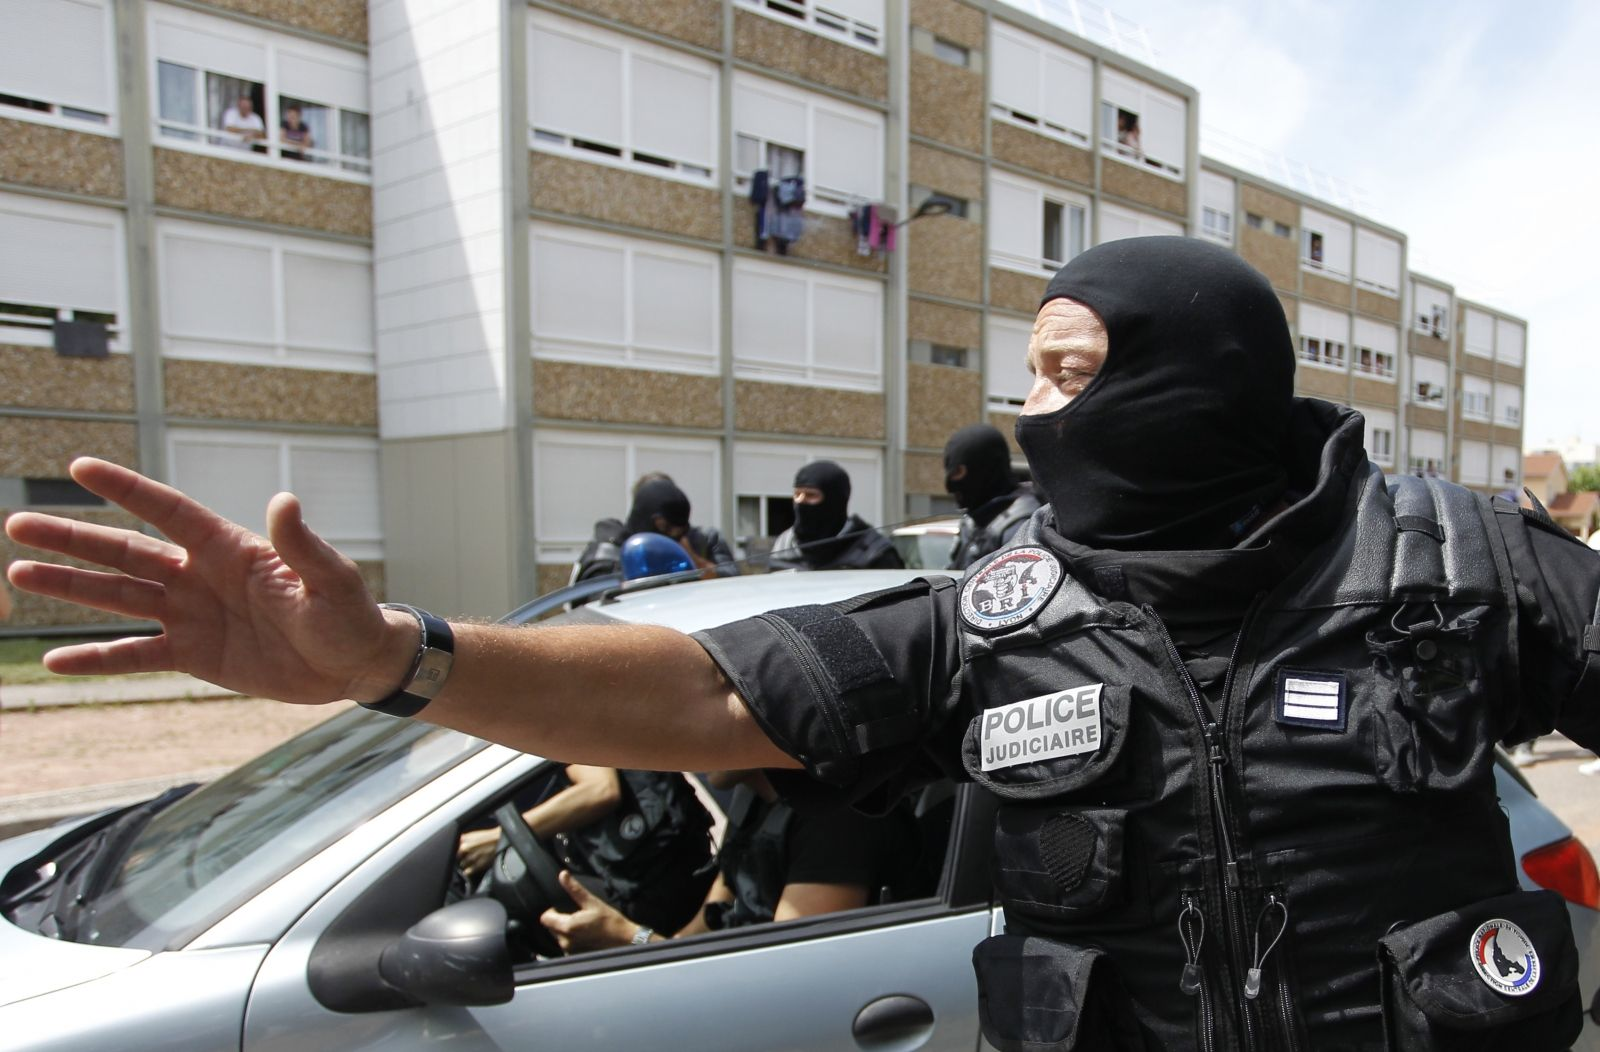 French police thwart terror plot